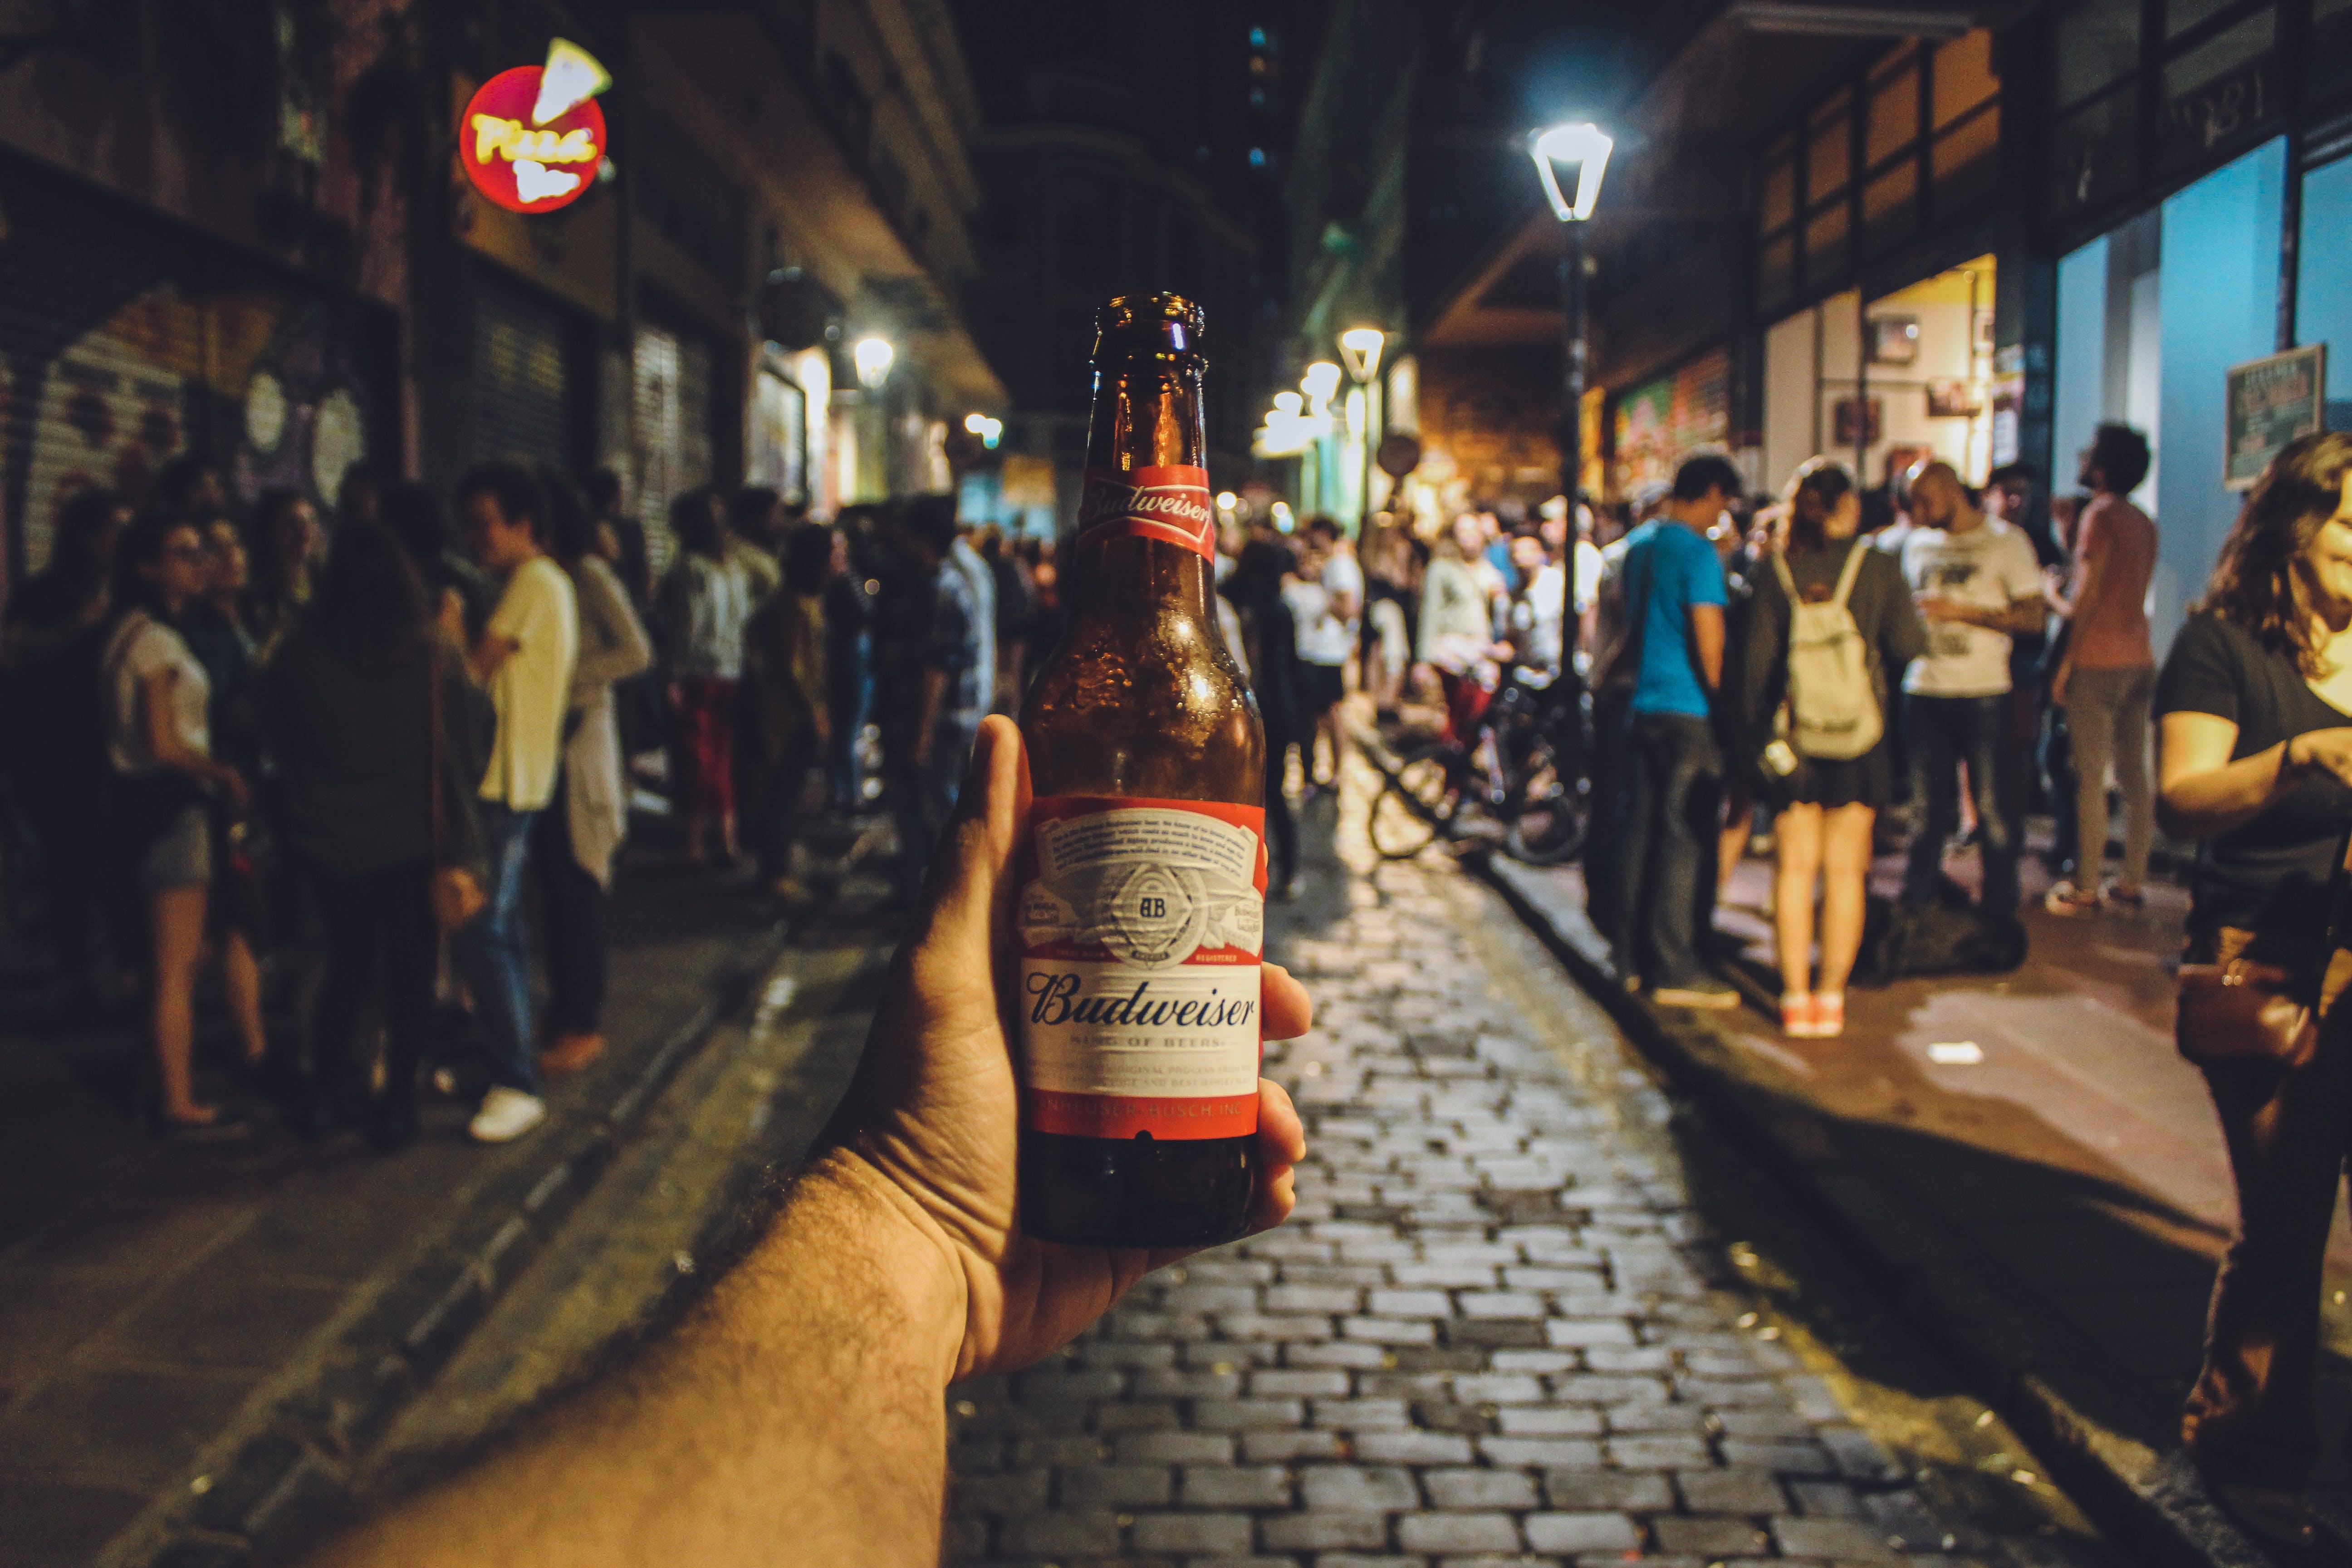 Person Holding Budweiser Bottle